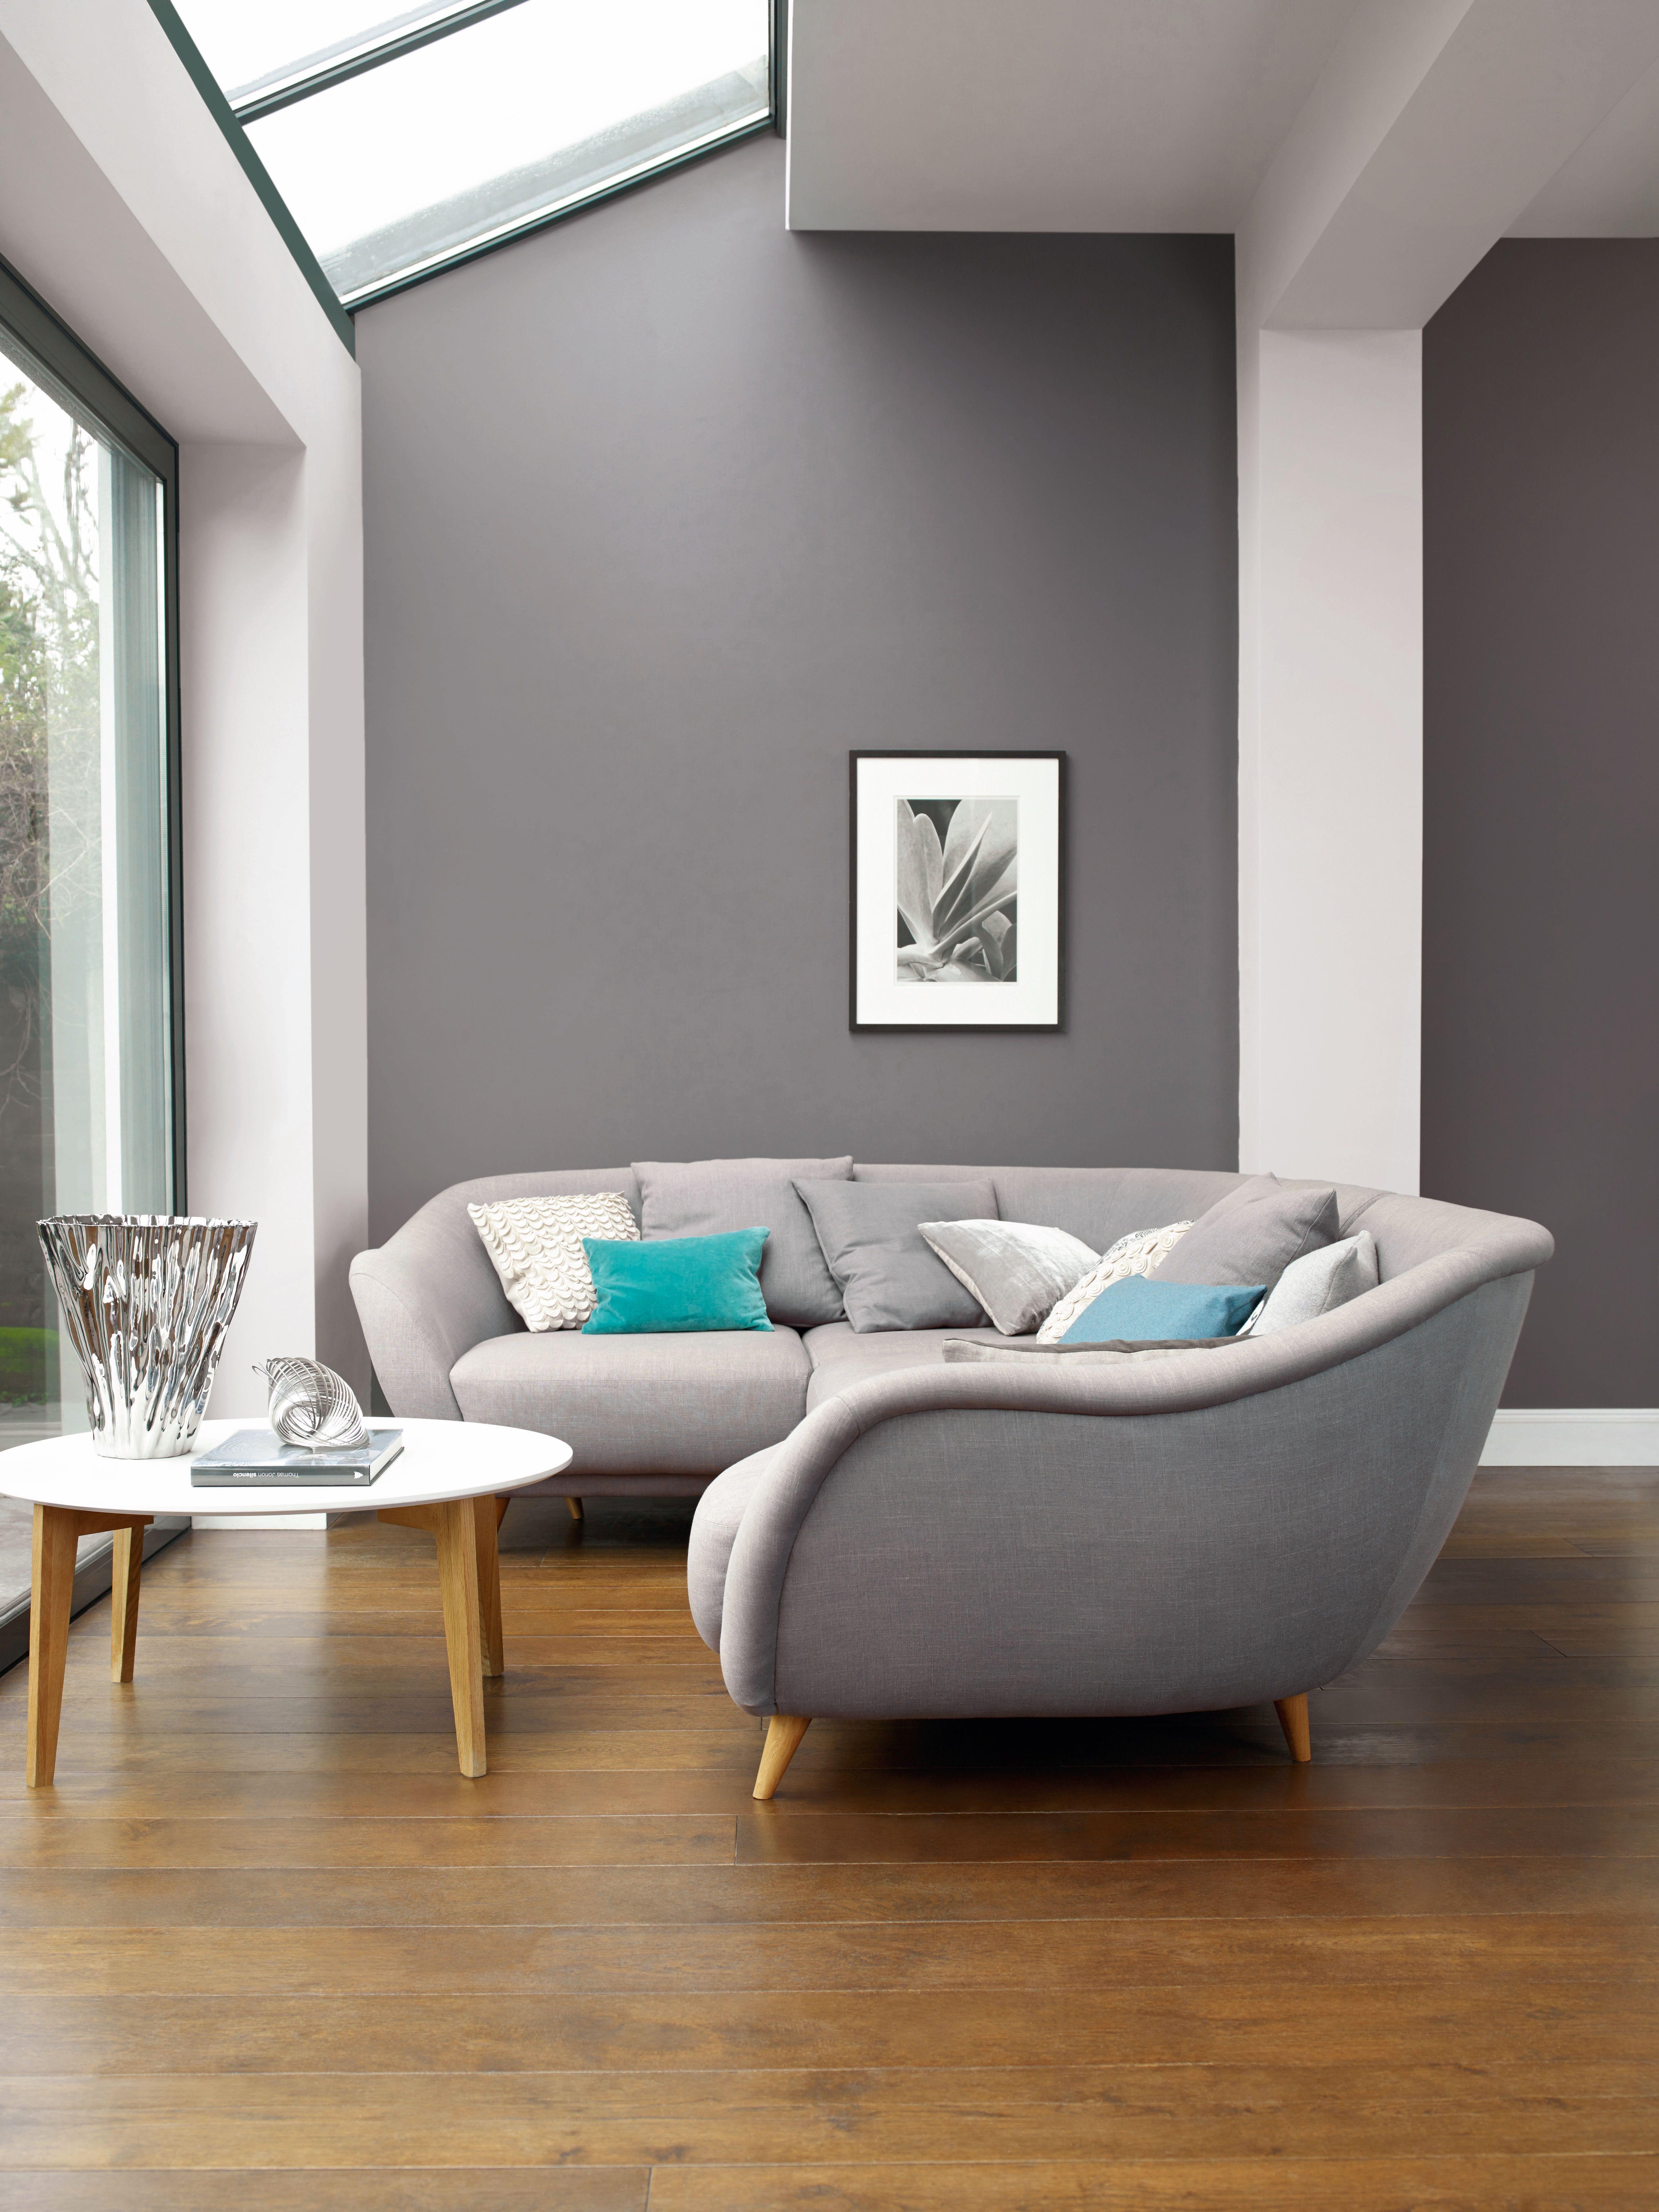 Image Gallery Crafty Design Living Room Feature Wall Colour Ideas Best About Gray Rooms Pinterest Grey Walls Dekorasi Rumah Ruangan Rumah